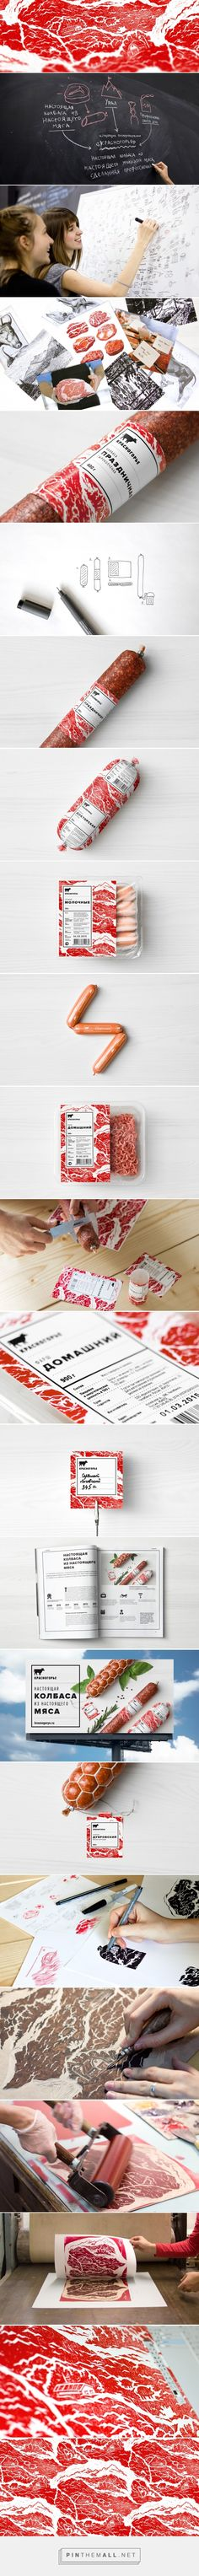 Check out the linocut progress on Krasnogorie meat packaging design by Science (Russia) - http://www.packagingoftheworld.com/2016/06/krasnogorie.html